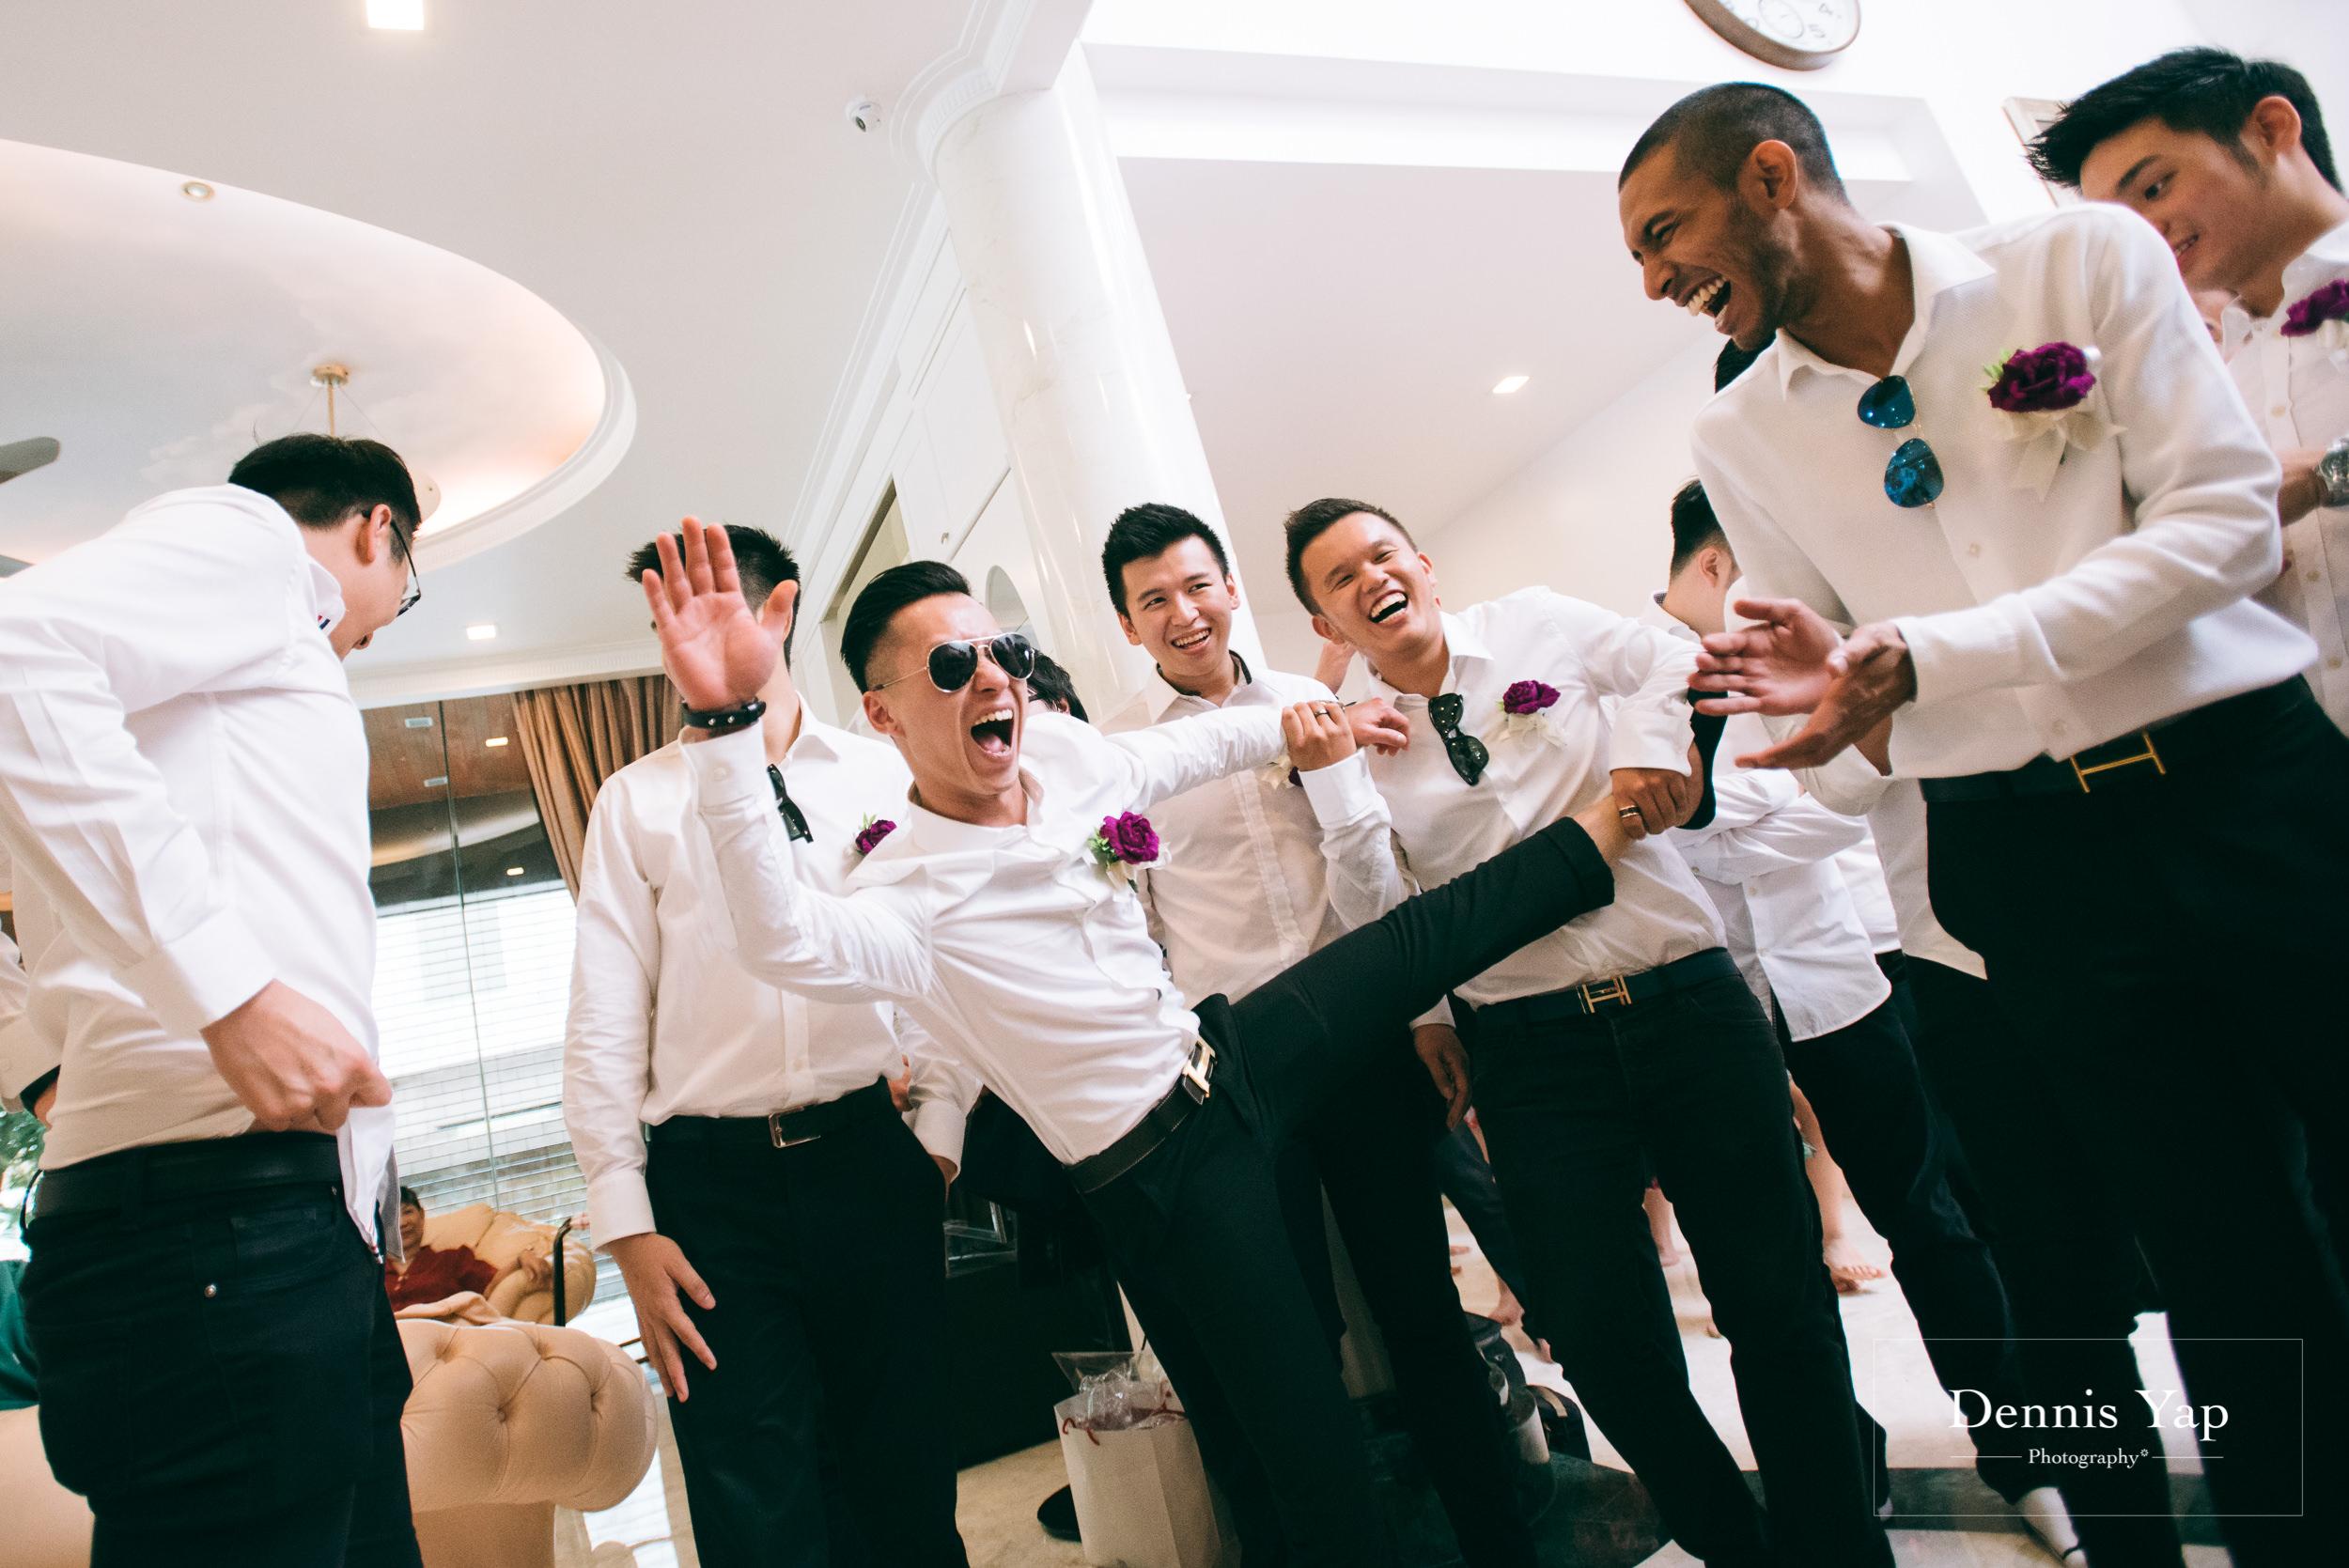 ivan constance wedding day renaissance hotel dennis yap photography-20.jpg